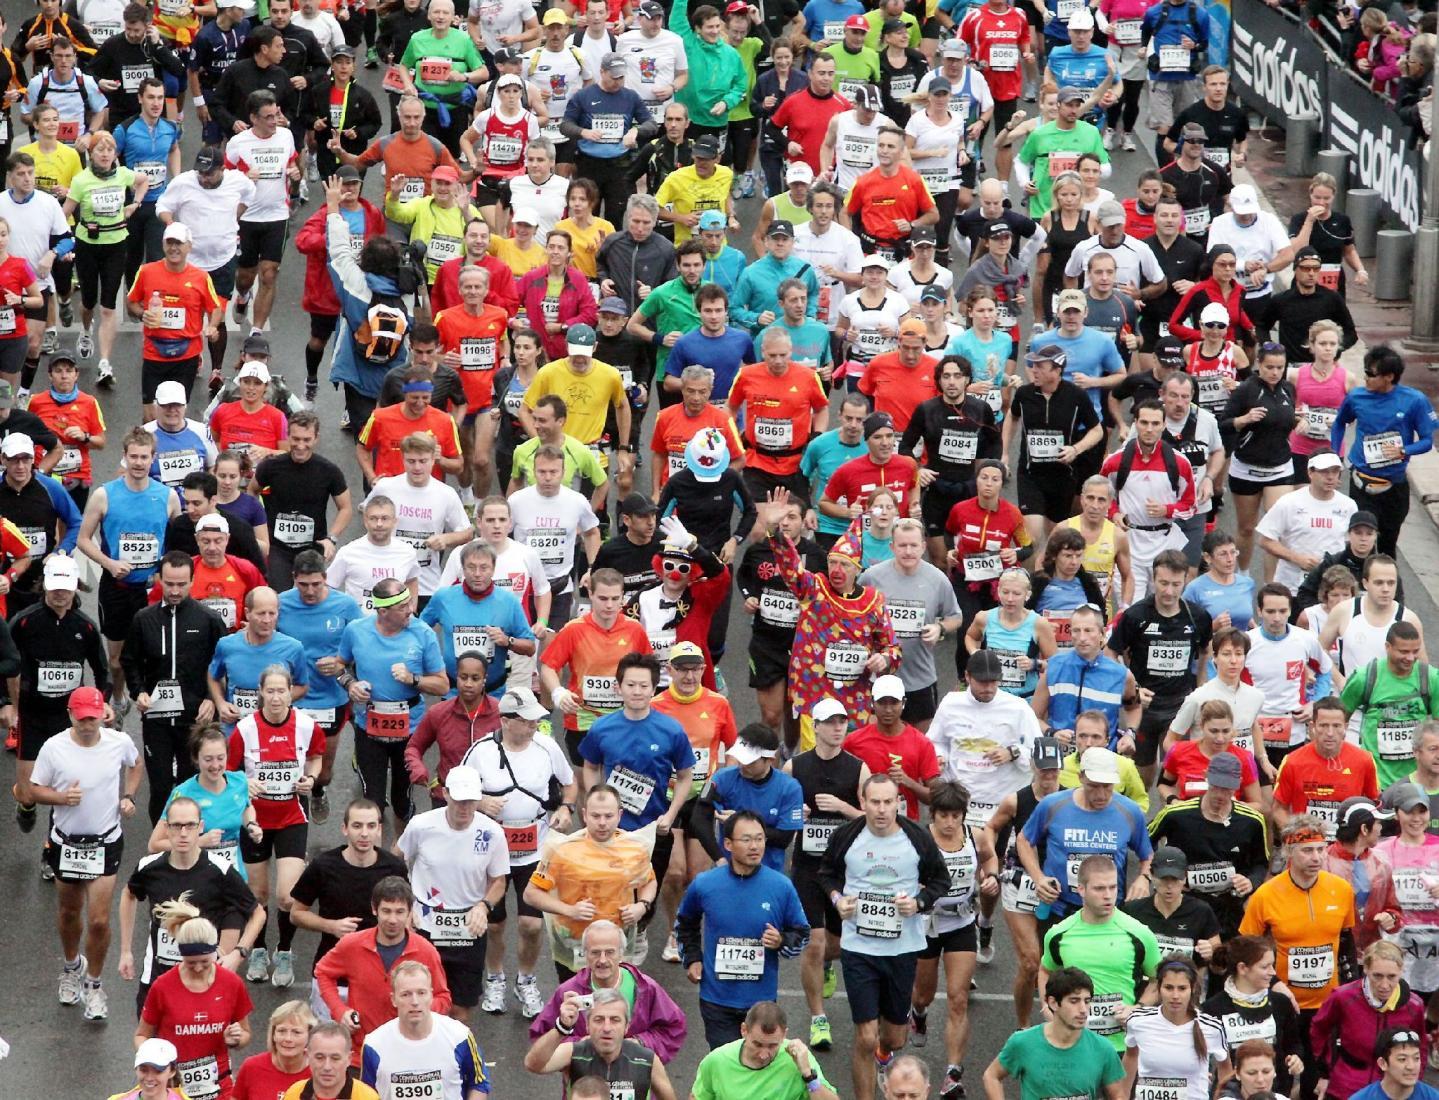 Lors du marathon Nice-Cannes 2012.